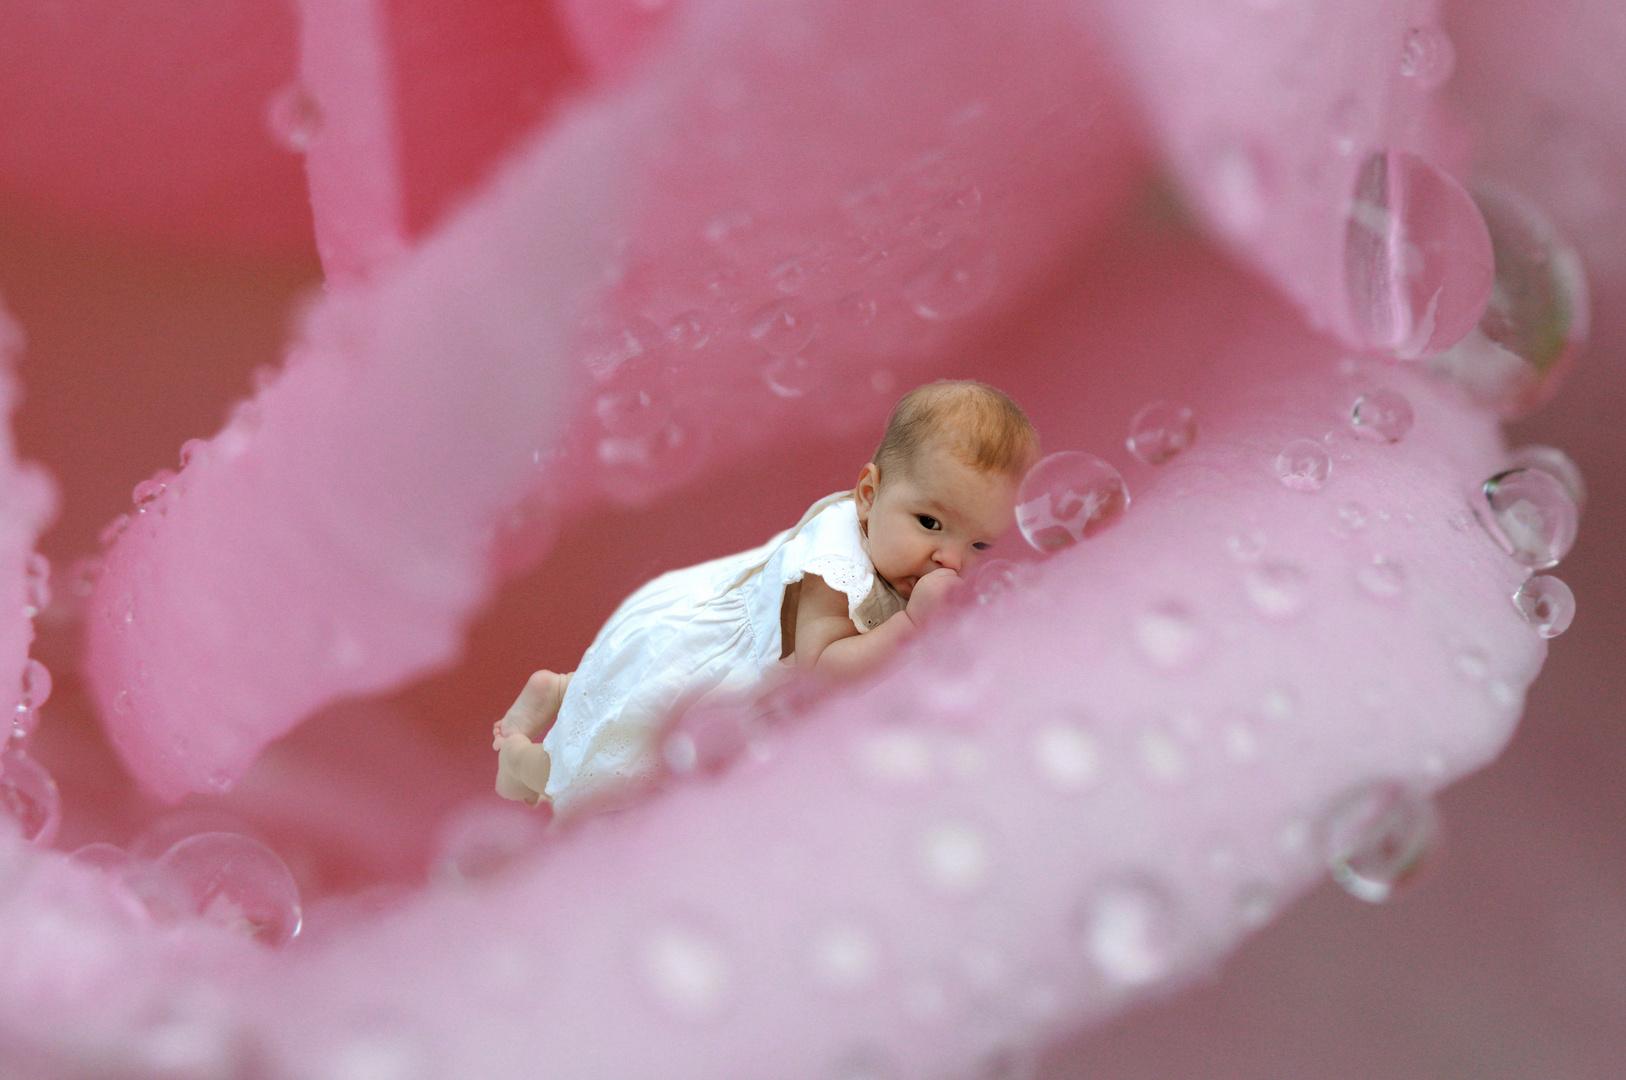 s e tr ume foto bild kinder babies menschen bilder auf fotocommunity. Black Bedroom Furniture Sets. Home Design Ideas